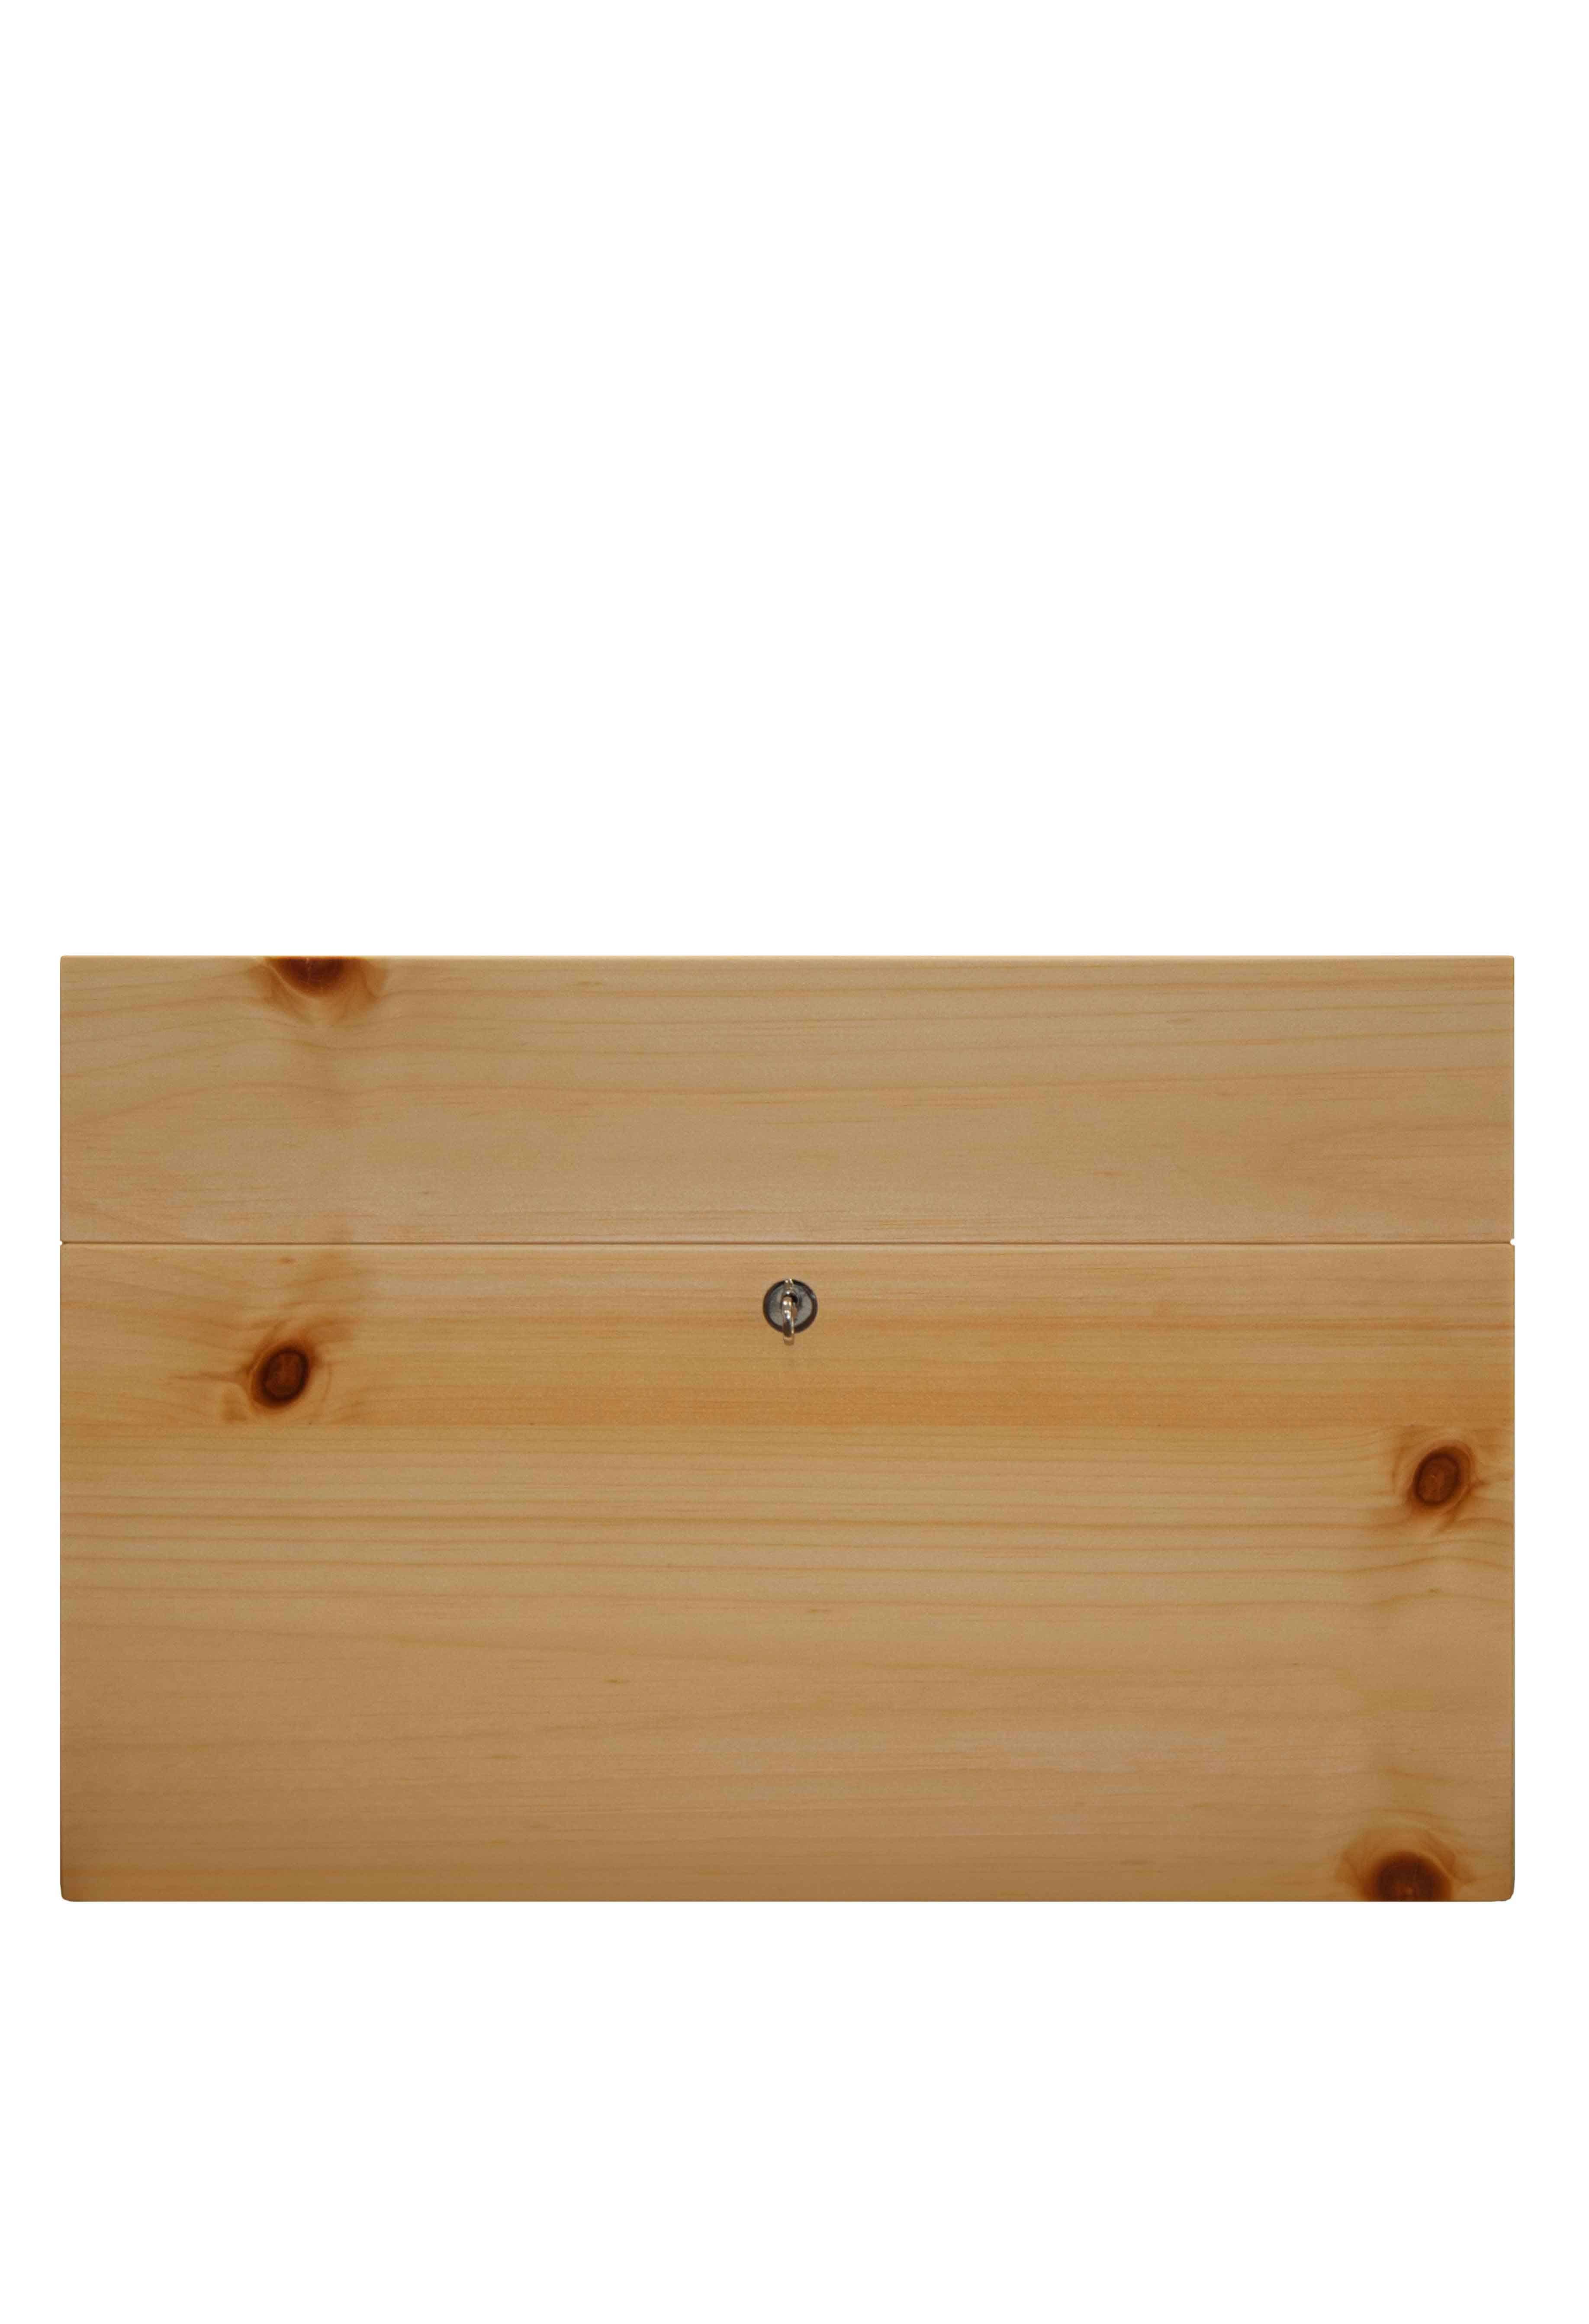 GERBER Humidor Cube Swiss Pine